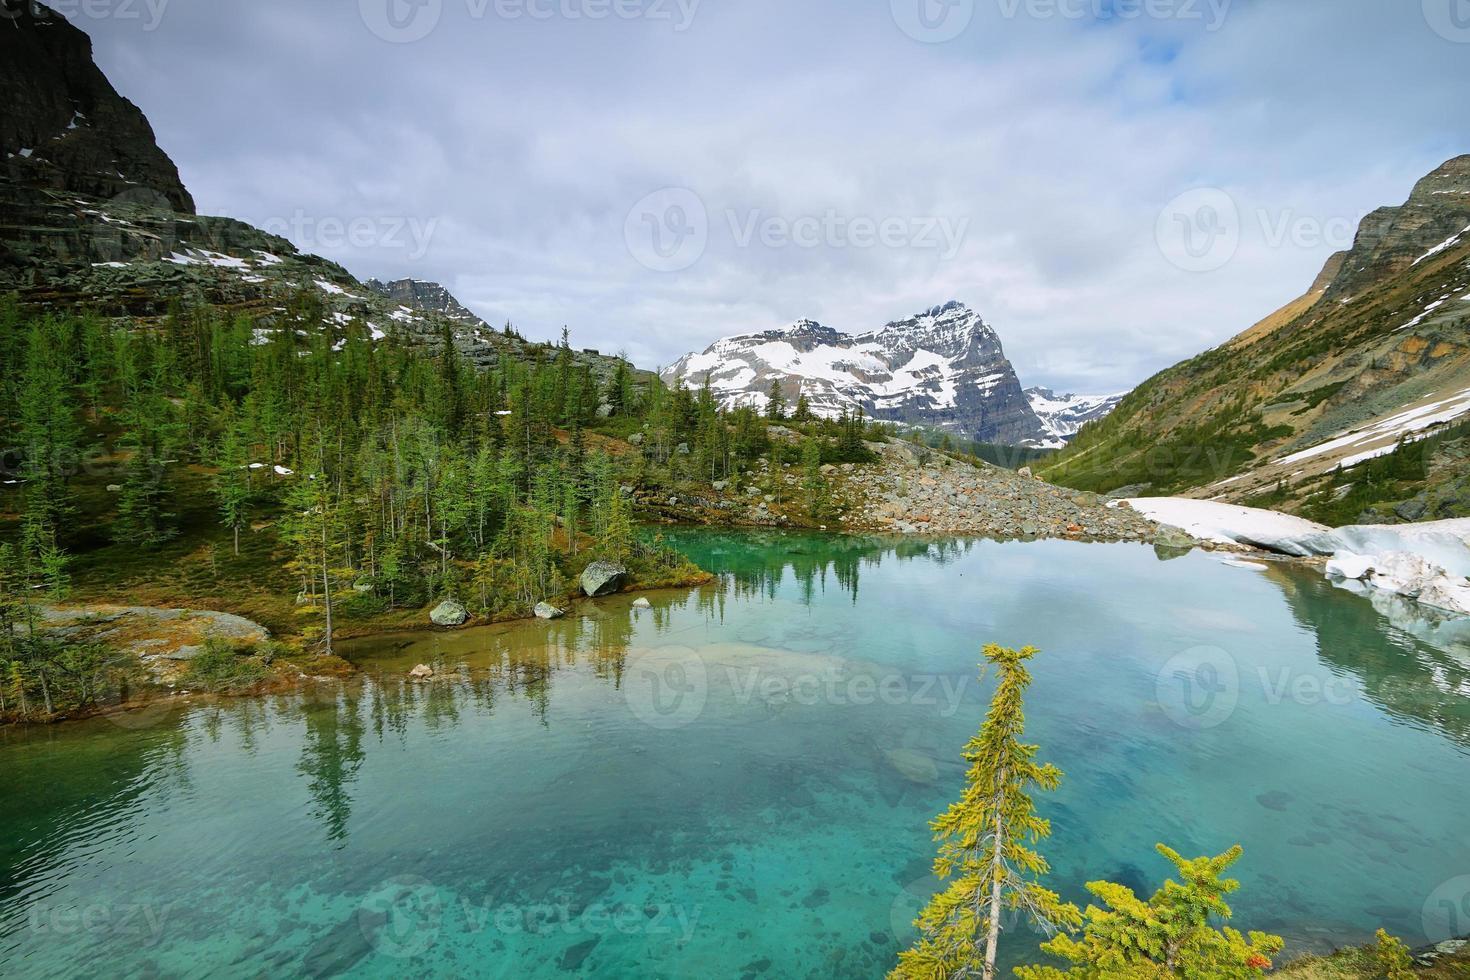 pequeno lago verde na trilha do lago oesa foto